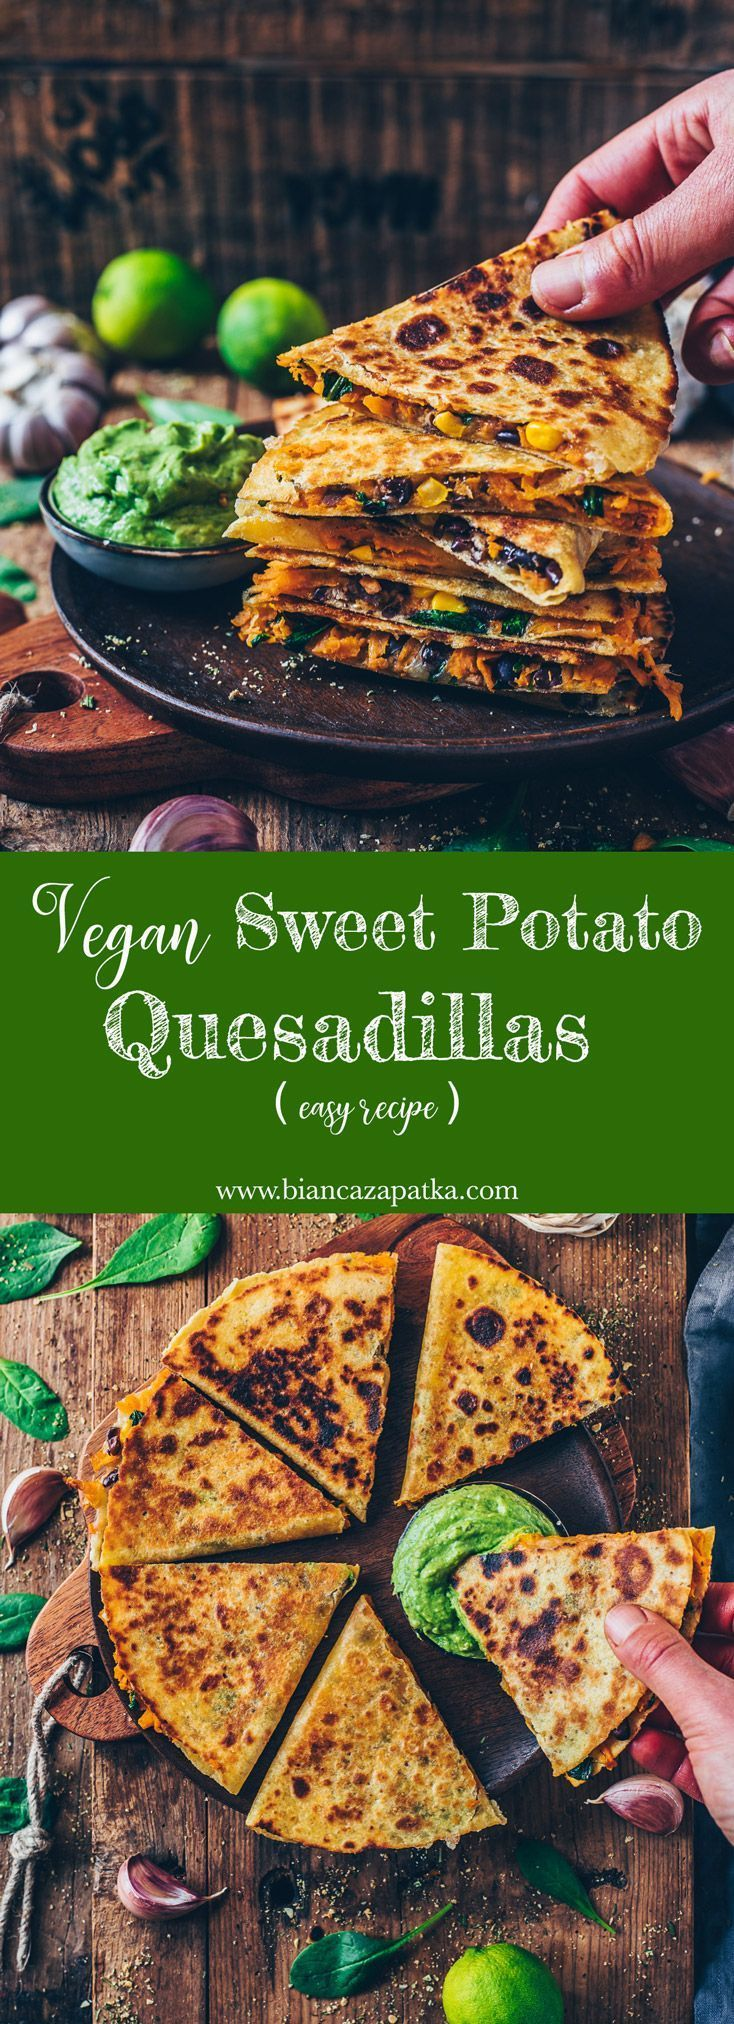 Vegan Sweet Potato Quesadillas easy recipe potato al horno asadas fritas recetas diet diet plan diet recipes recipes